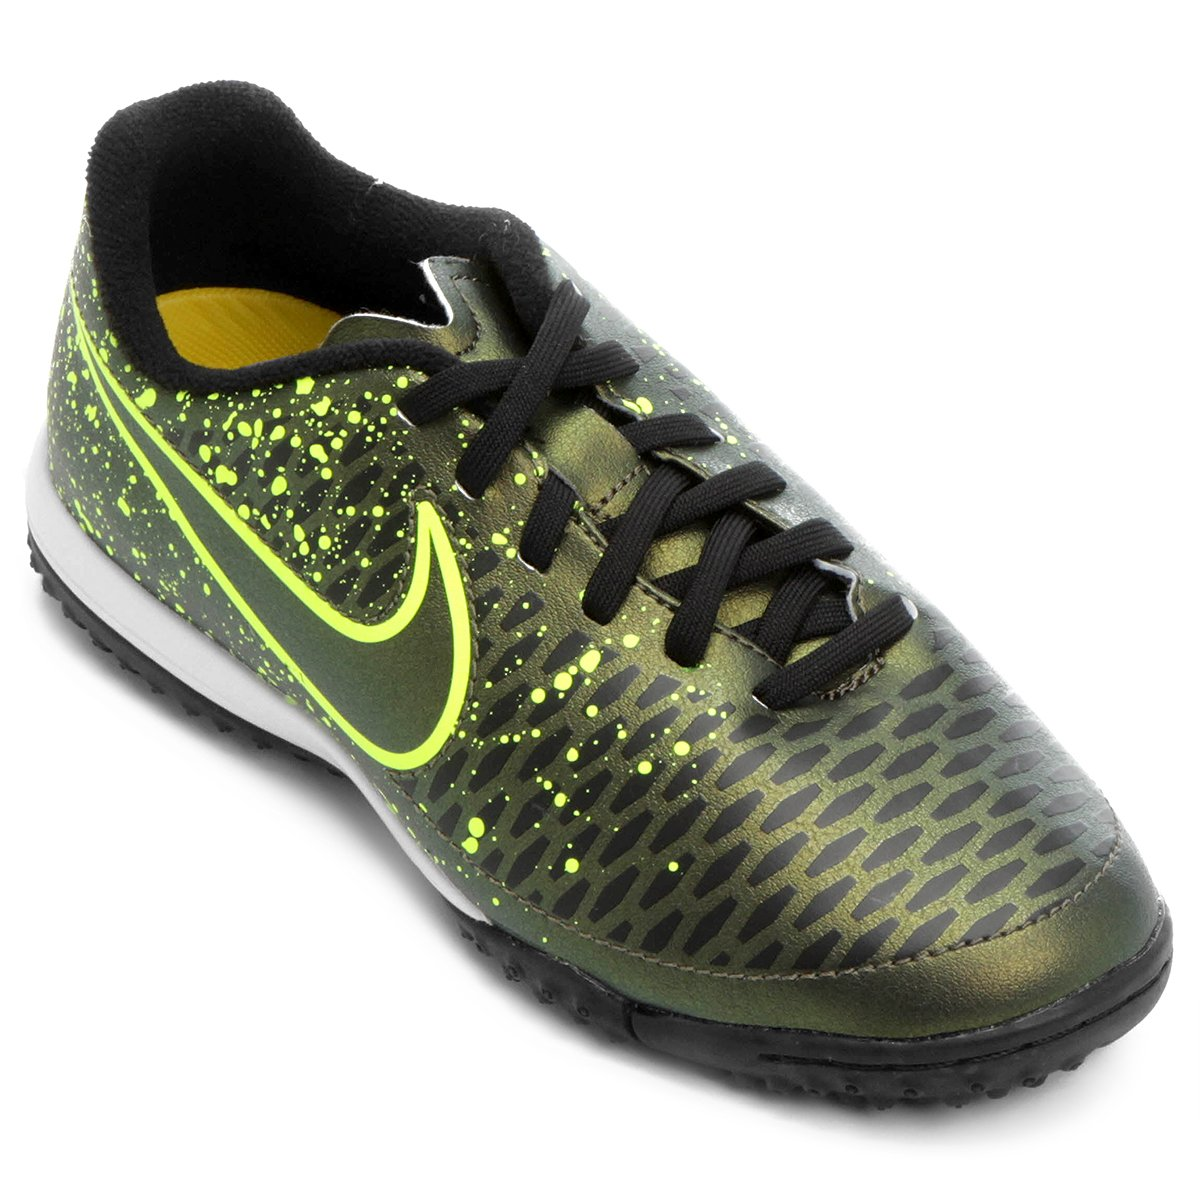 Chuteira Nike Magista Onda TF Society Infantil - Compre Agora  995034b8cbf20